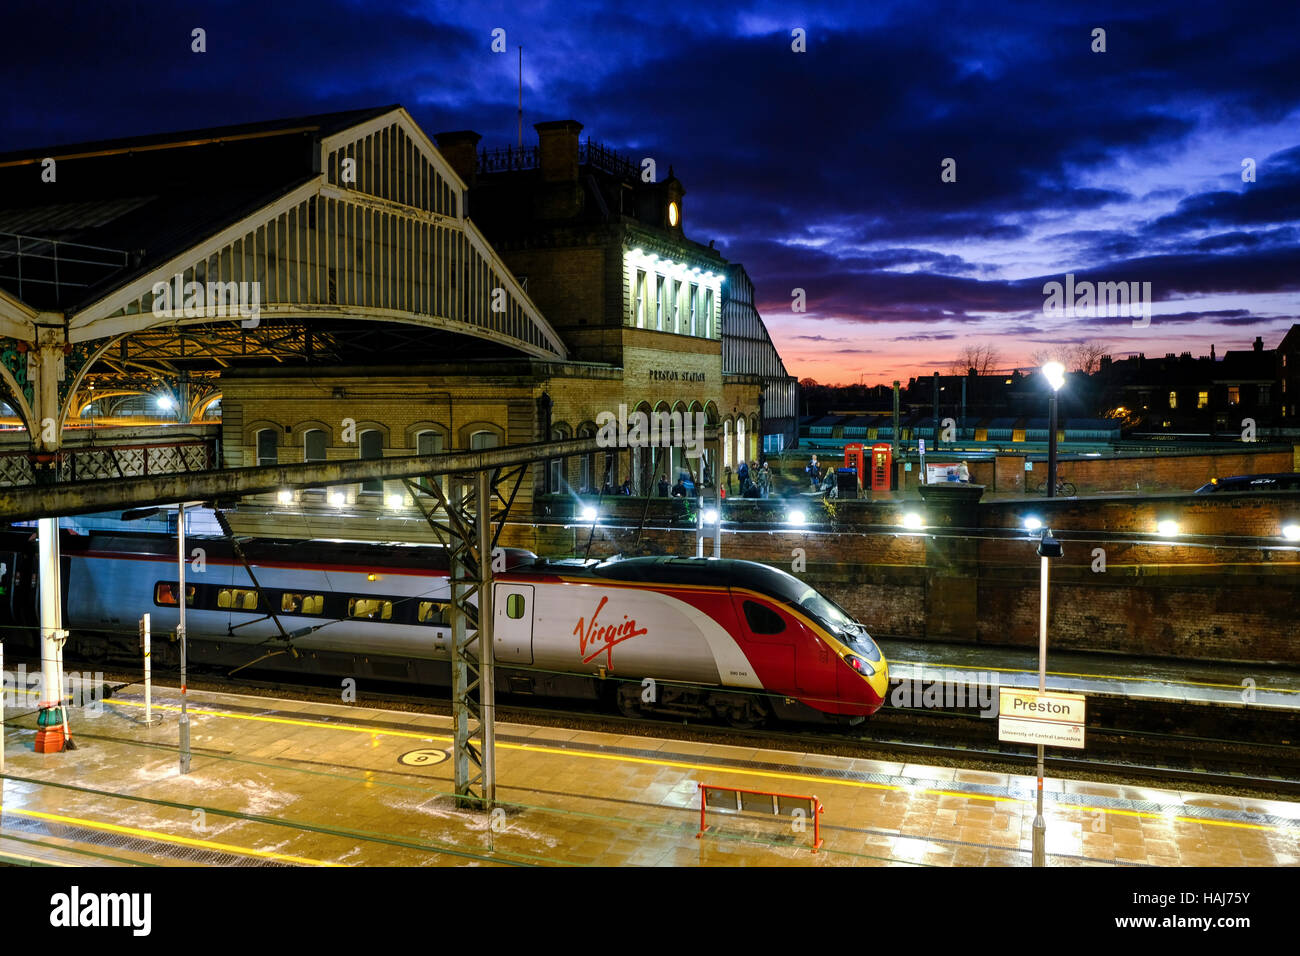 Virgin train at Preston Station on the West Coast line Stock Photo